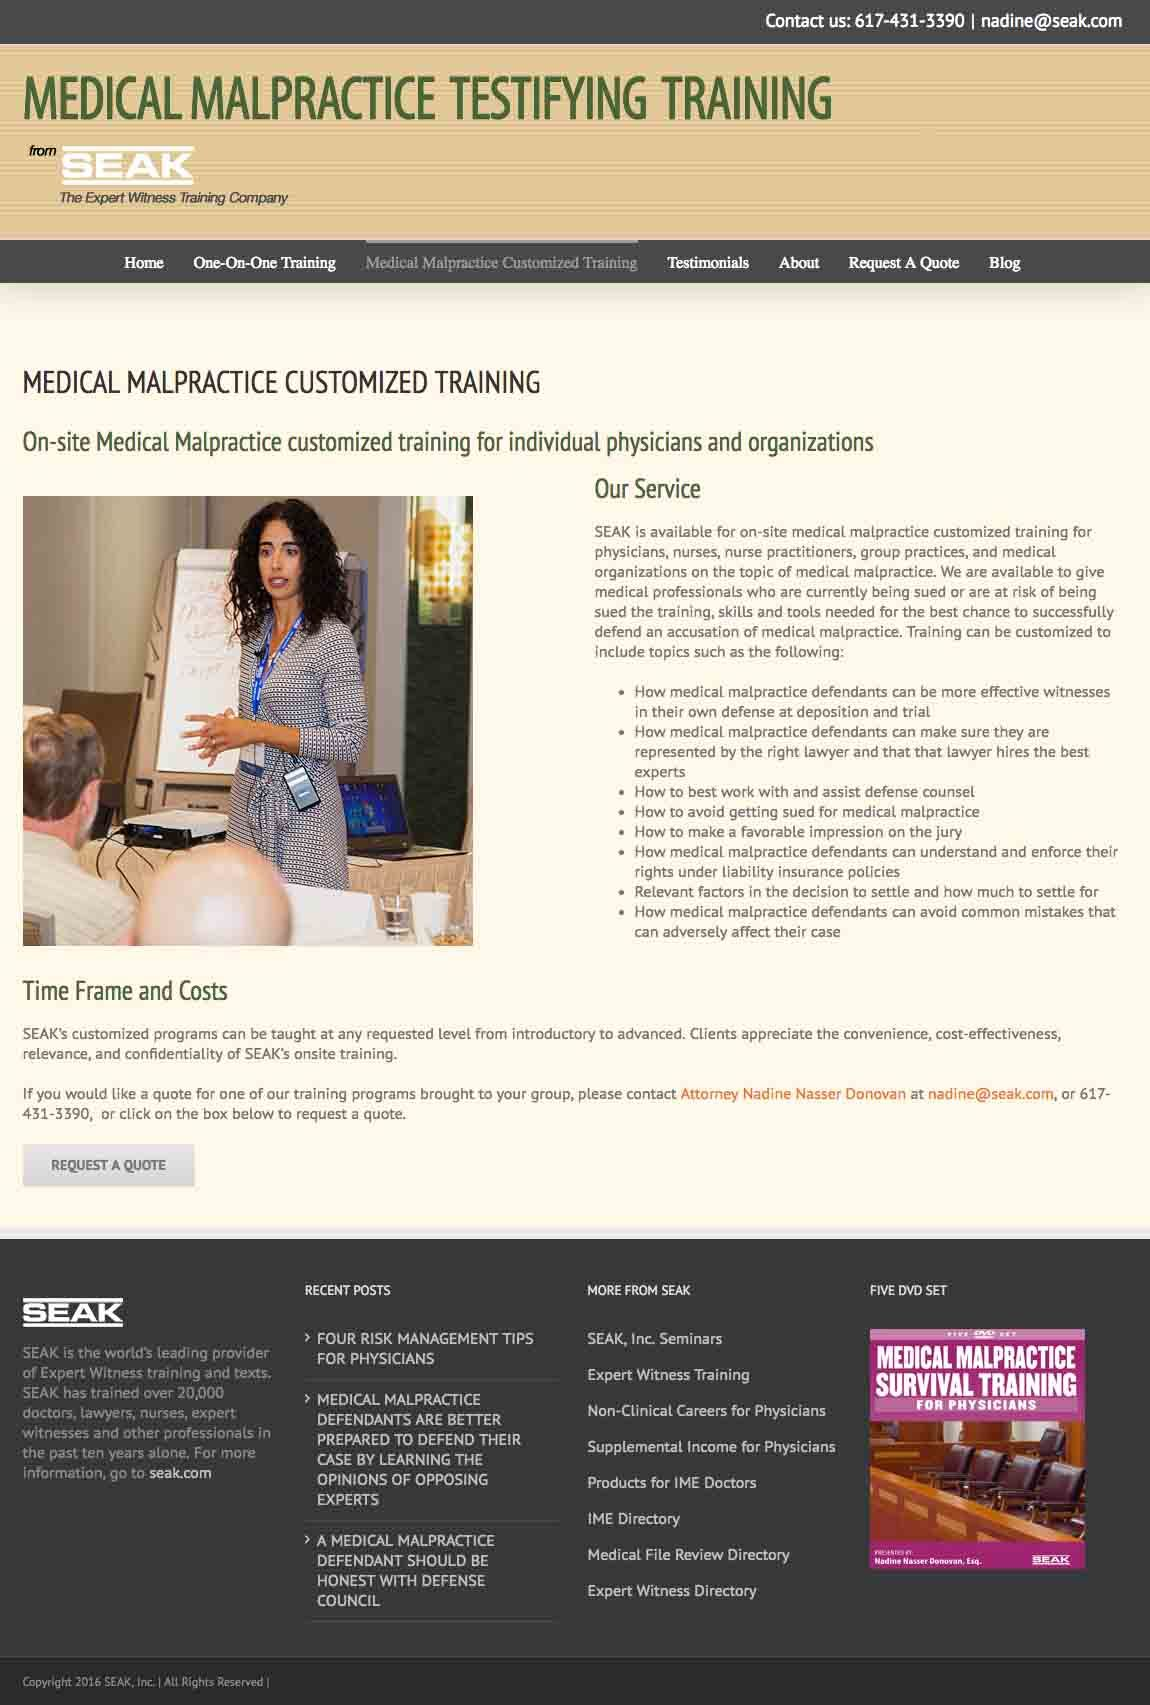 SEAK Malpractice Testifying Training